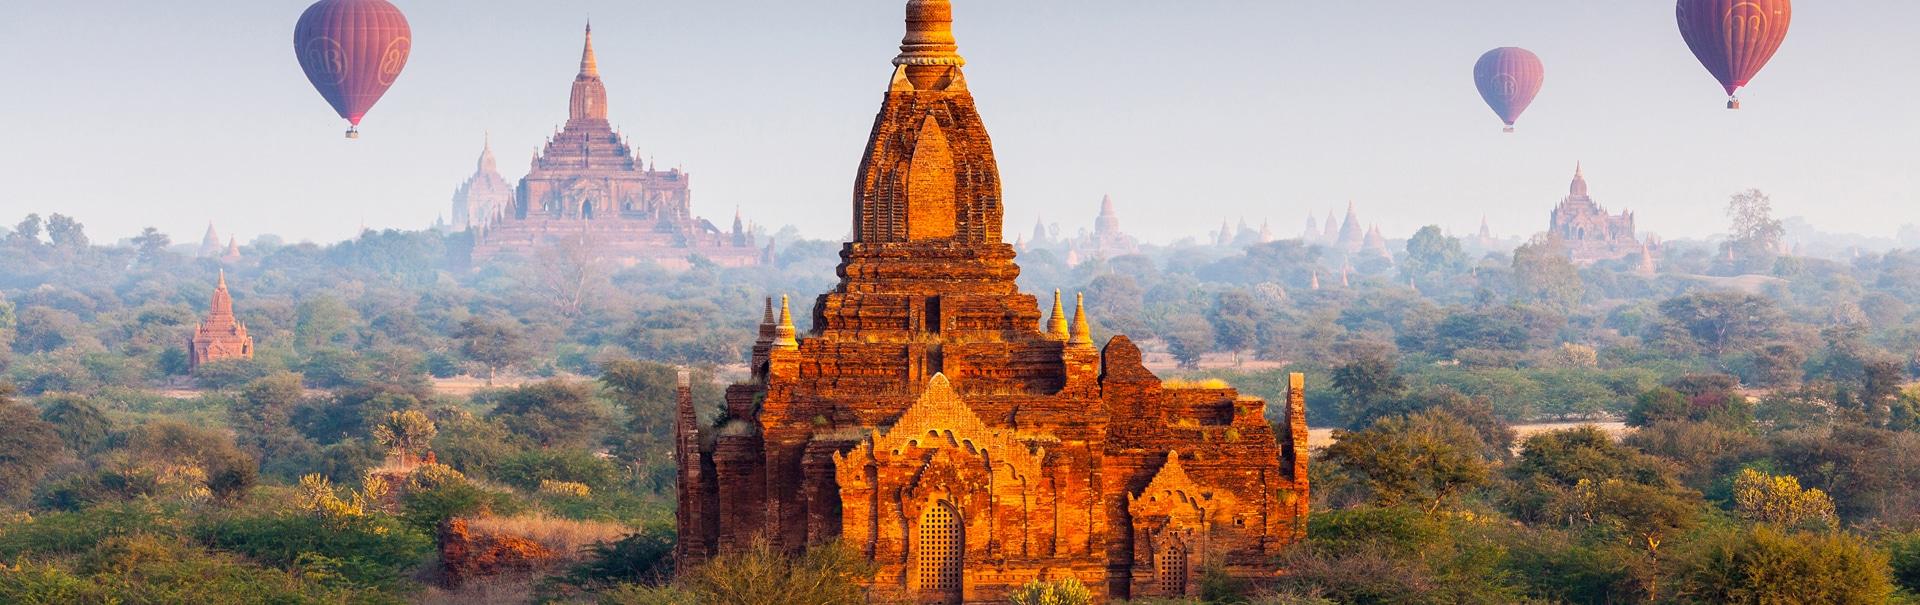 Mystical Myanmar (SHMR1) Banner